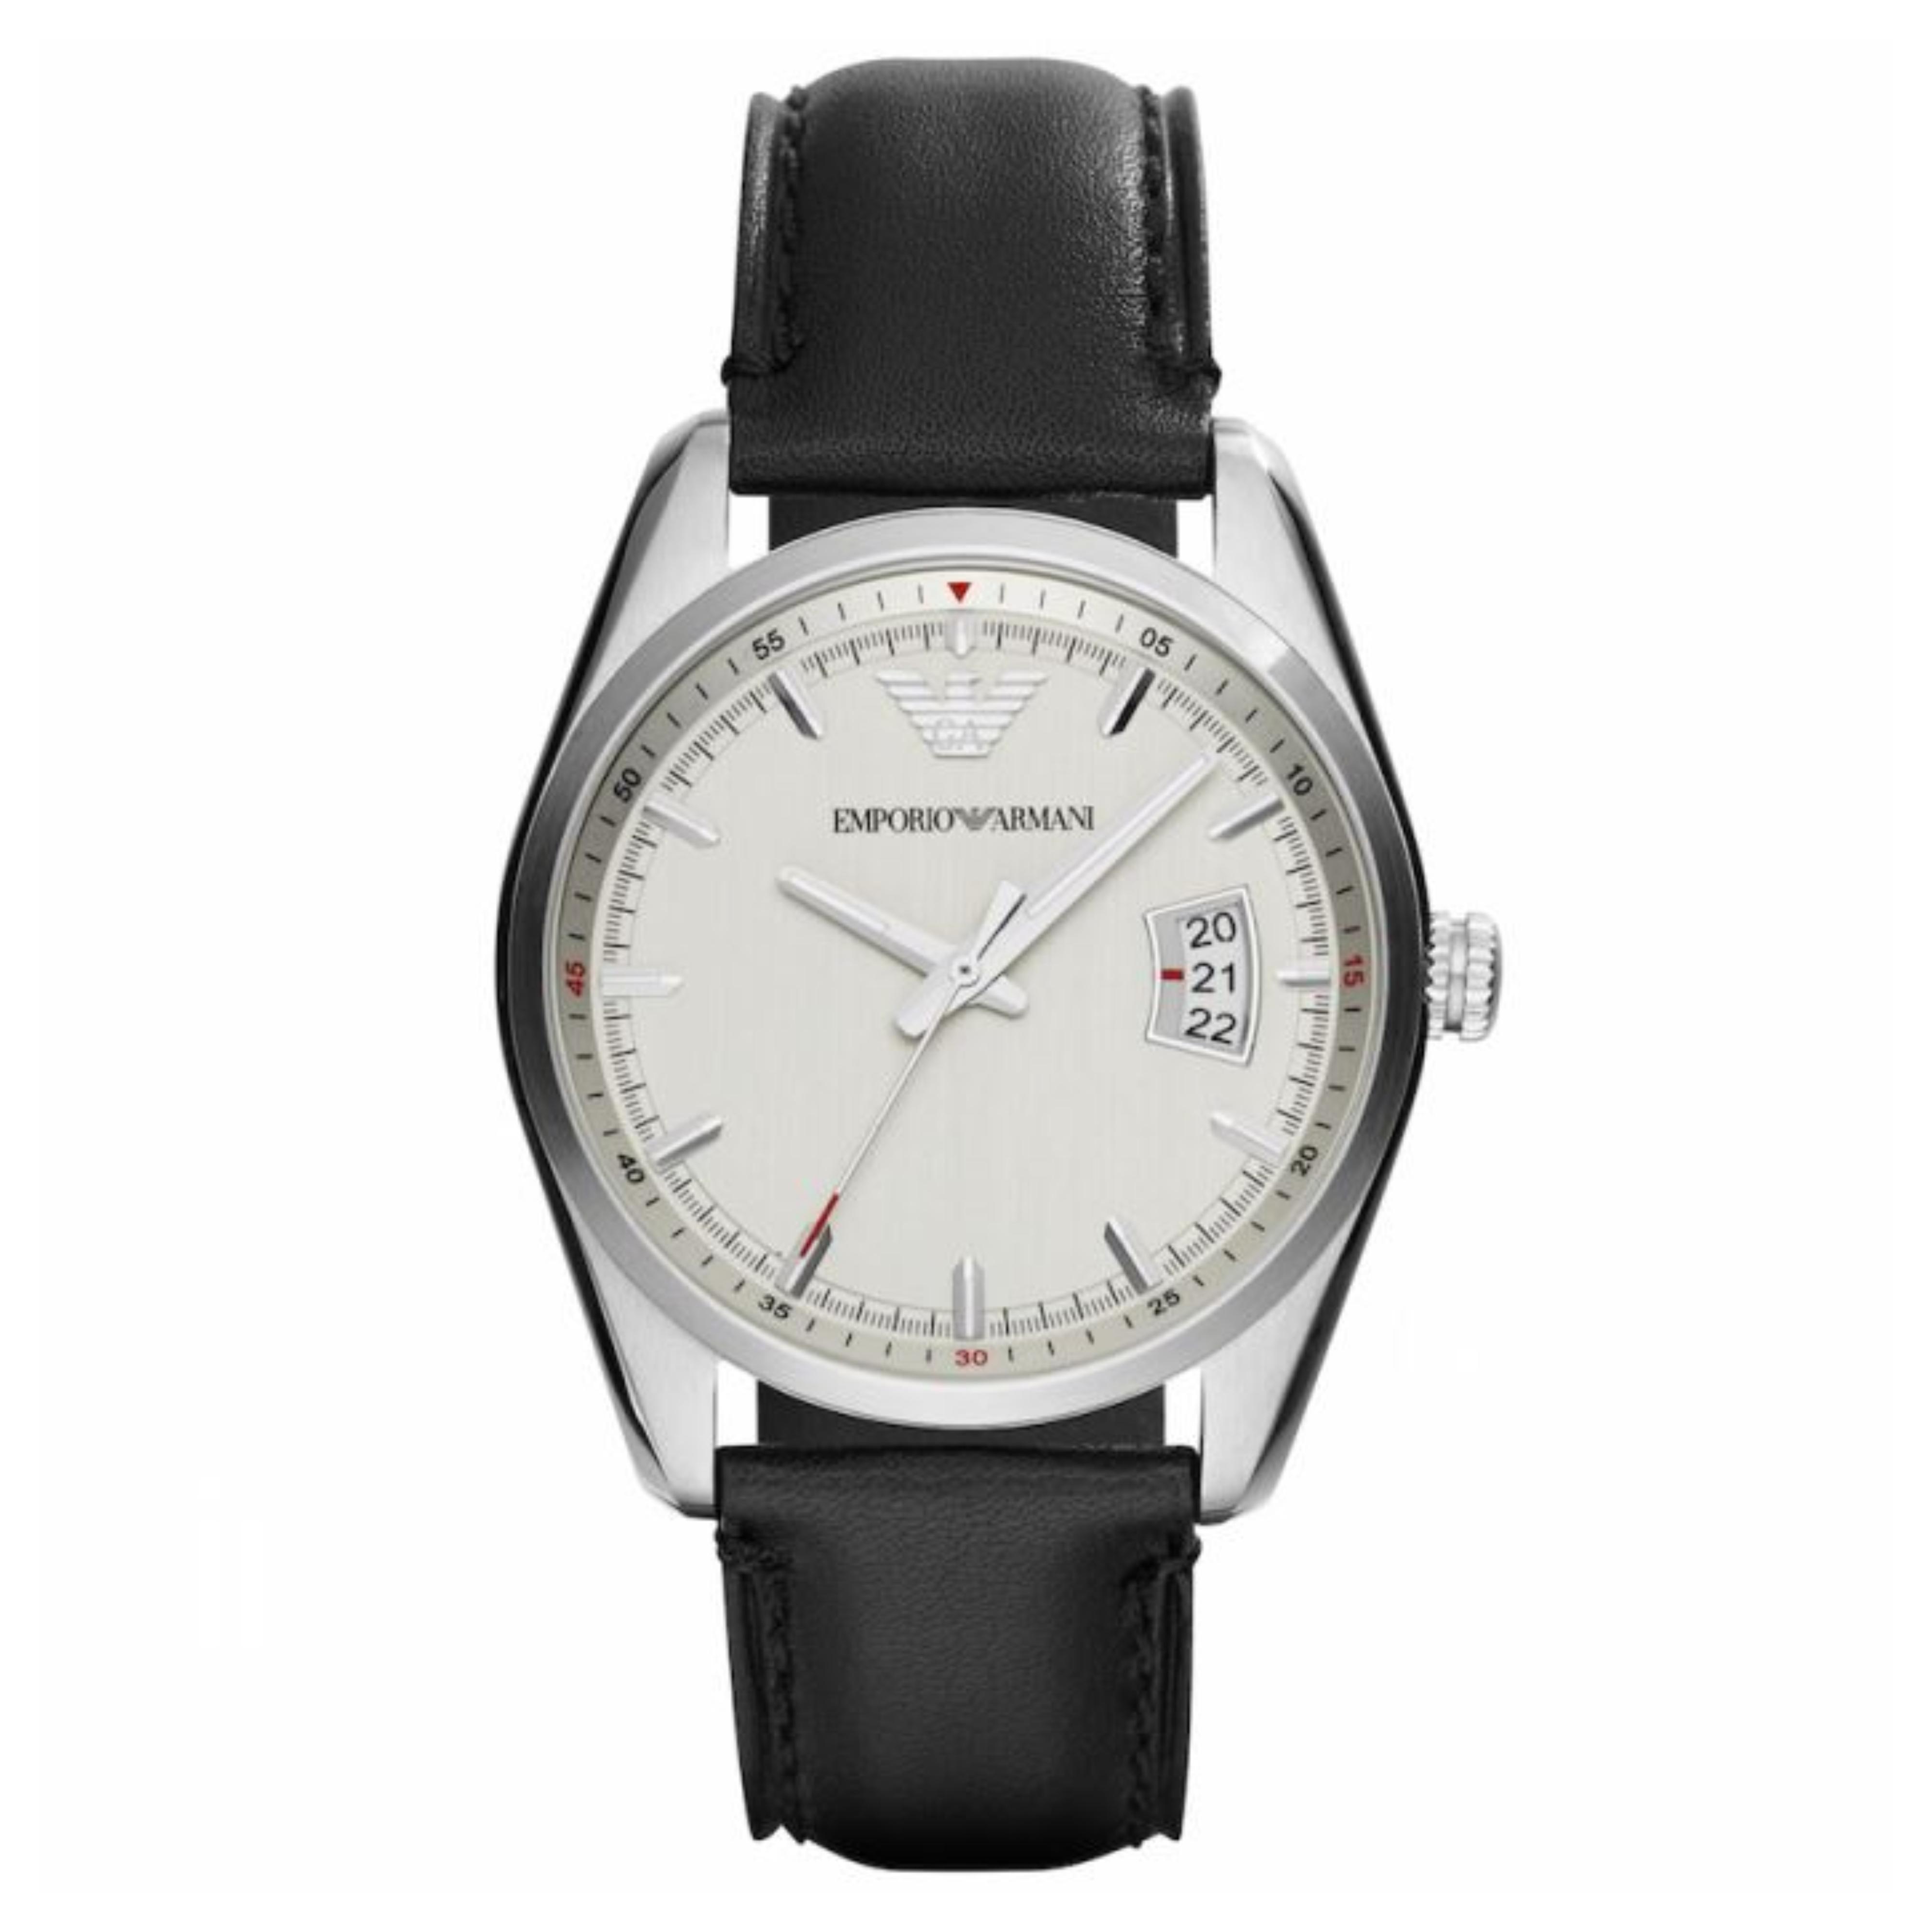 Emporio Armani Sportivo Men's Watch | Silver Round Dial | Black Leather Strap | AR6015